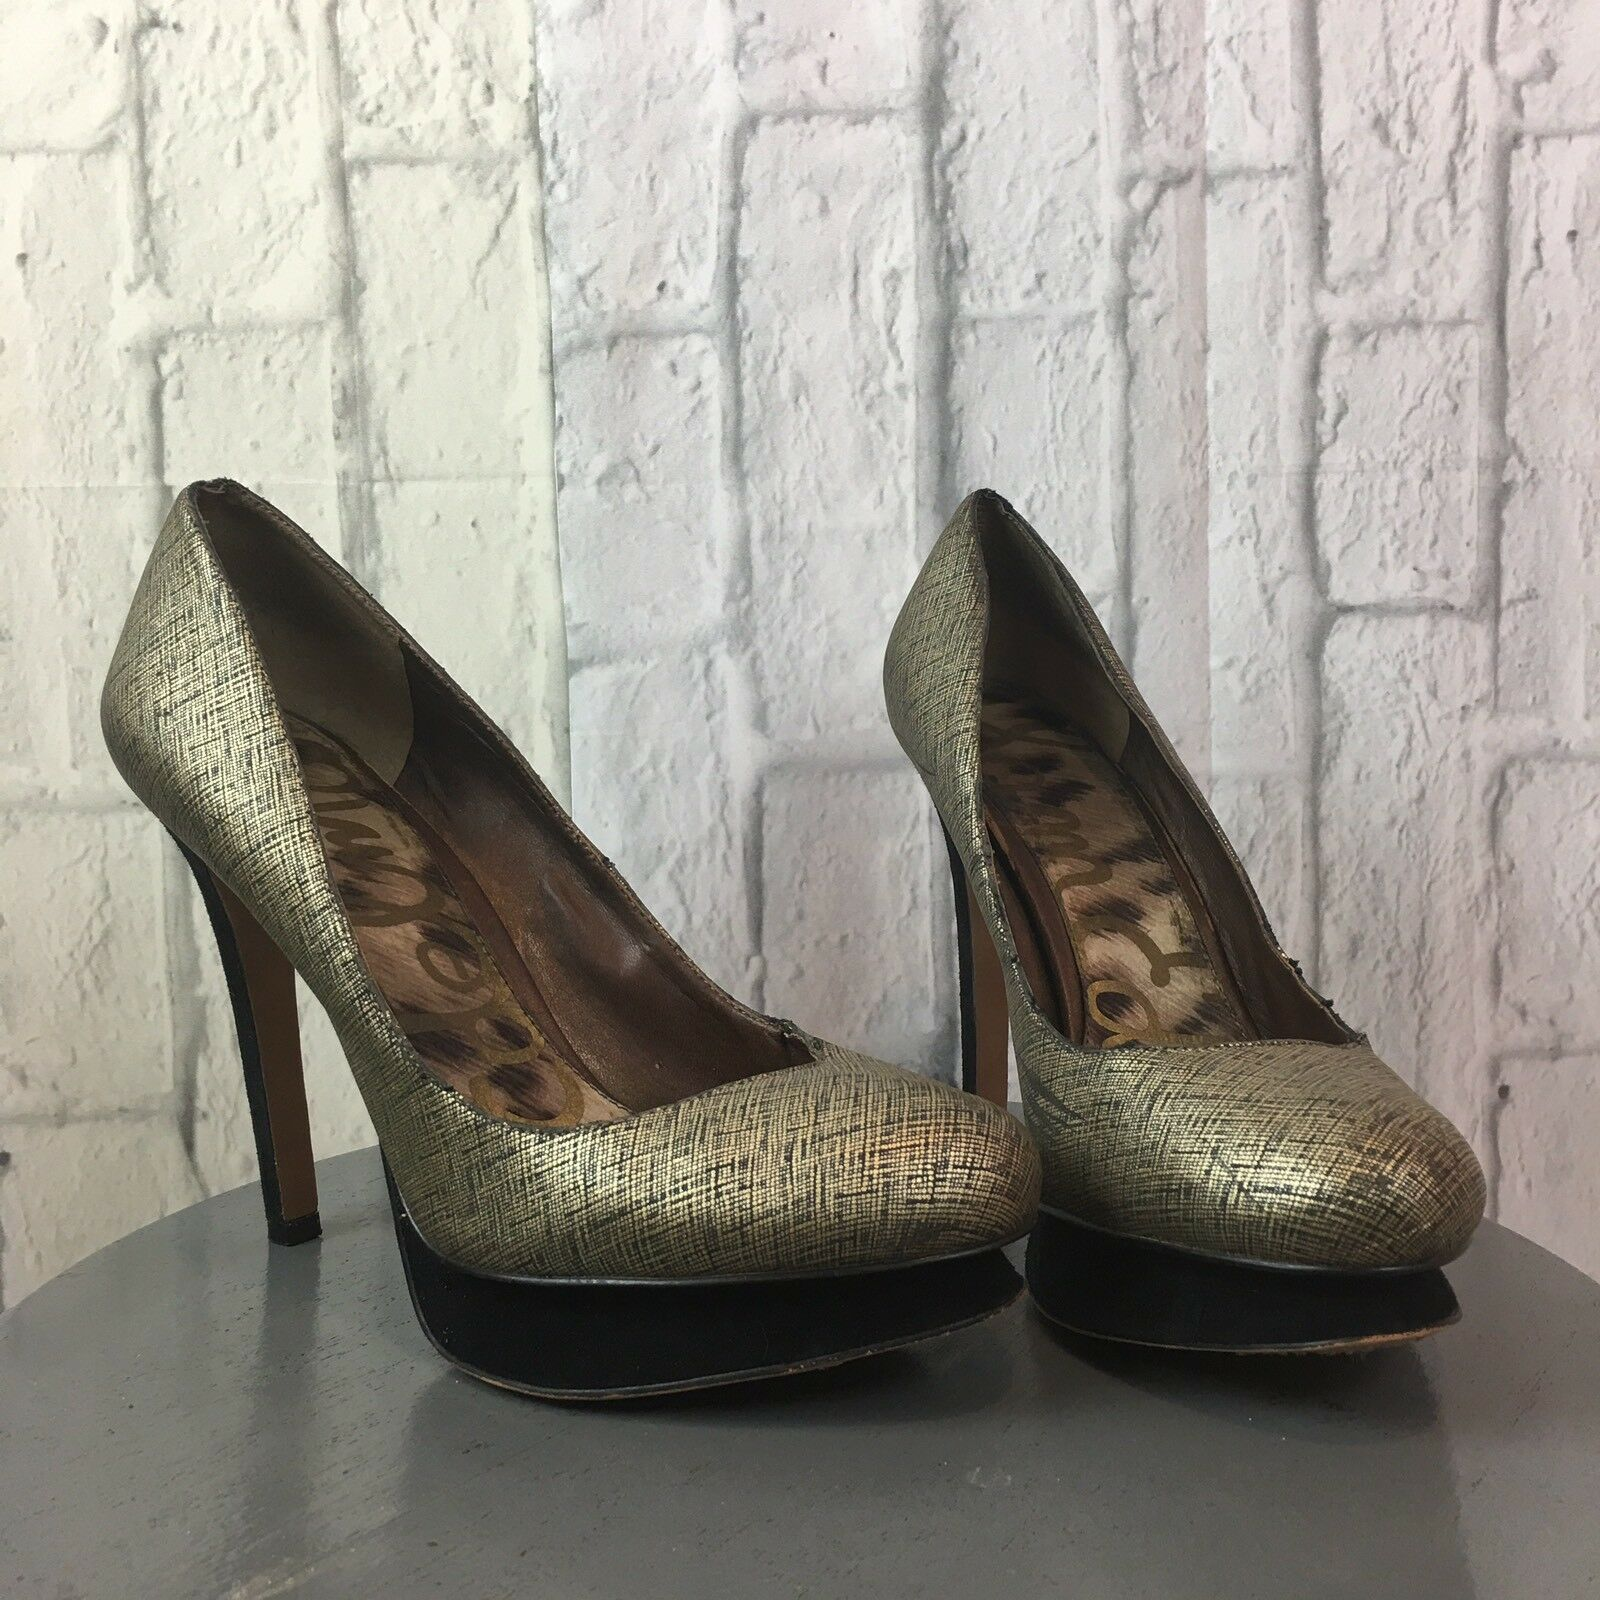 Sam Edelman Ulysa Platform Heels Size 9.5 Metallic Metallic 9.5 Women's Shoes Classic gold bd77e7